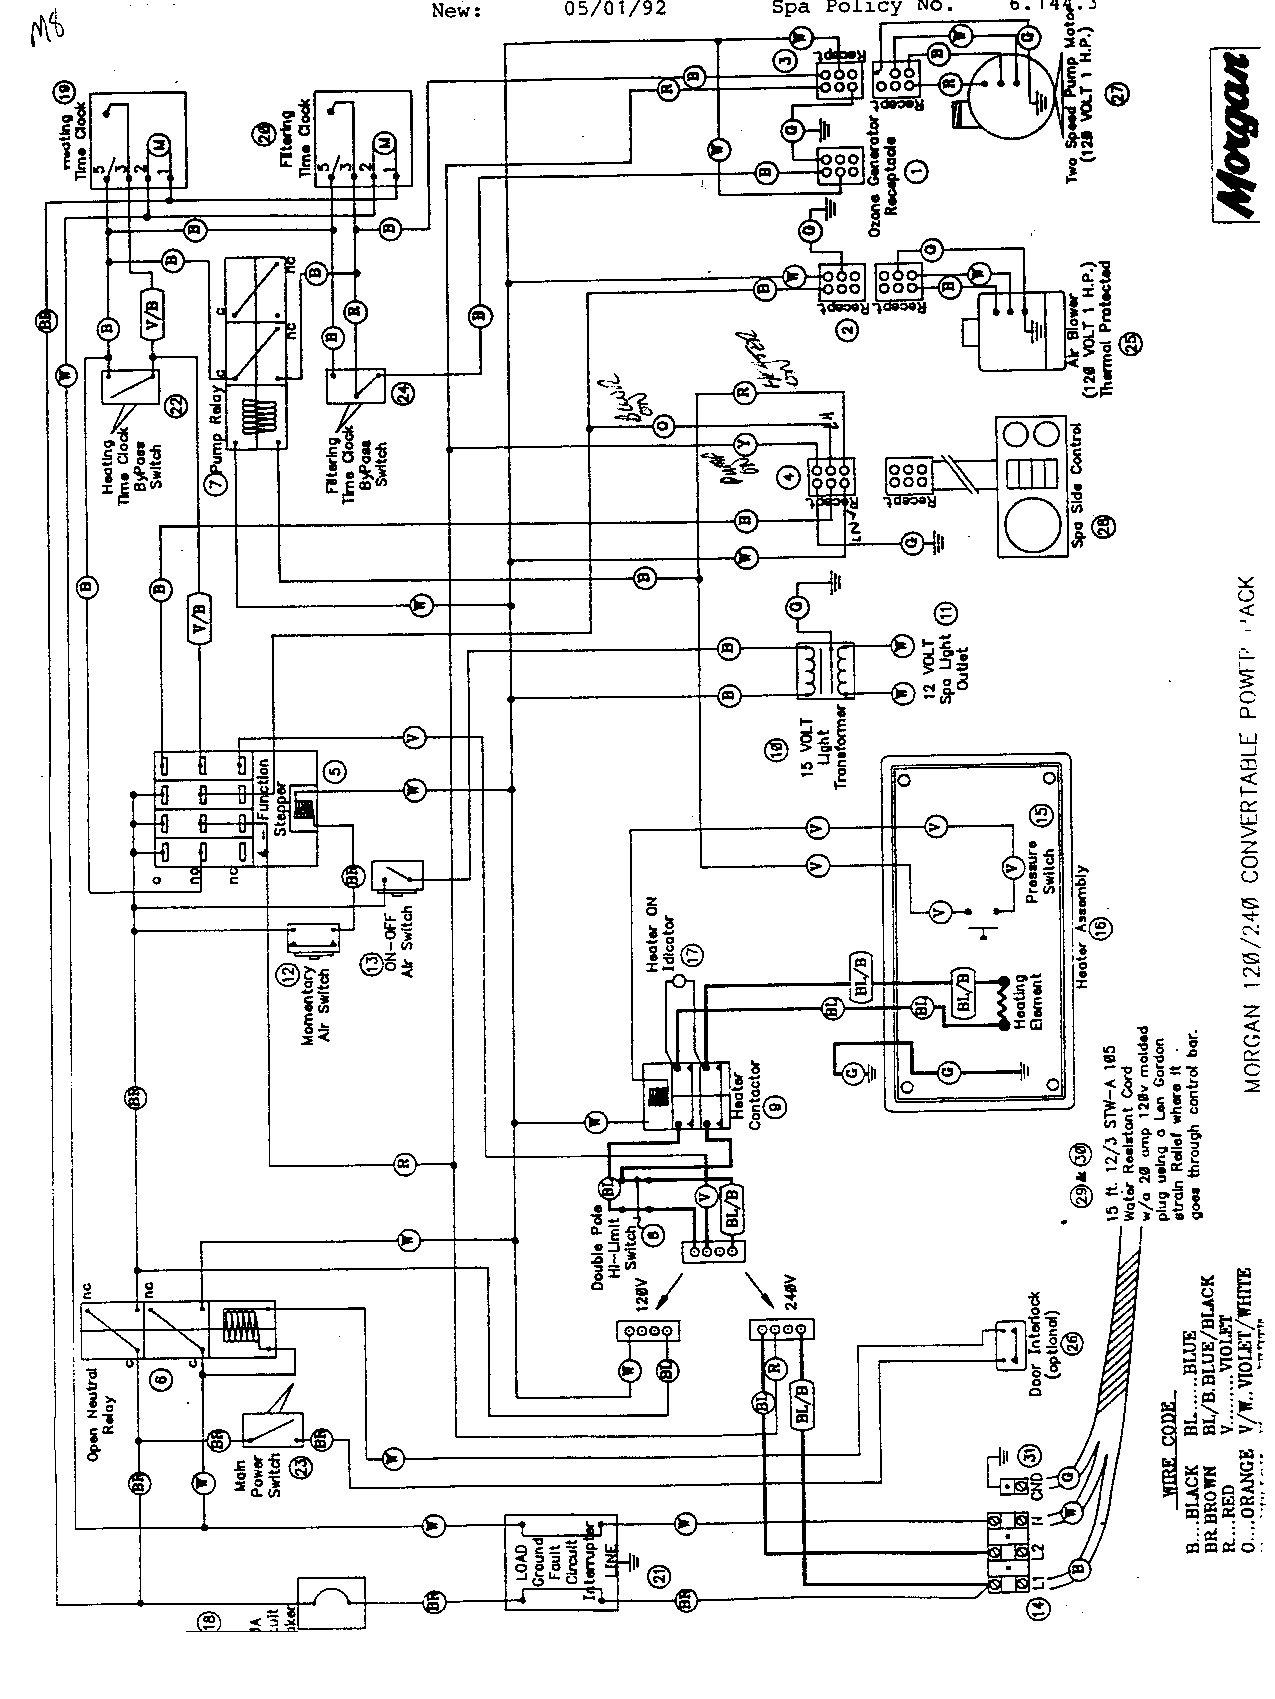 Thermospa Wiring Diagram